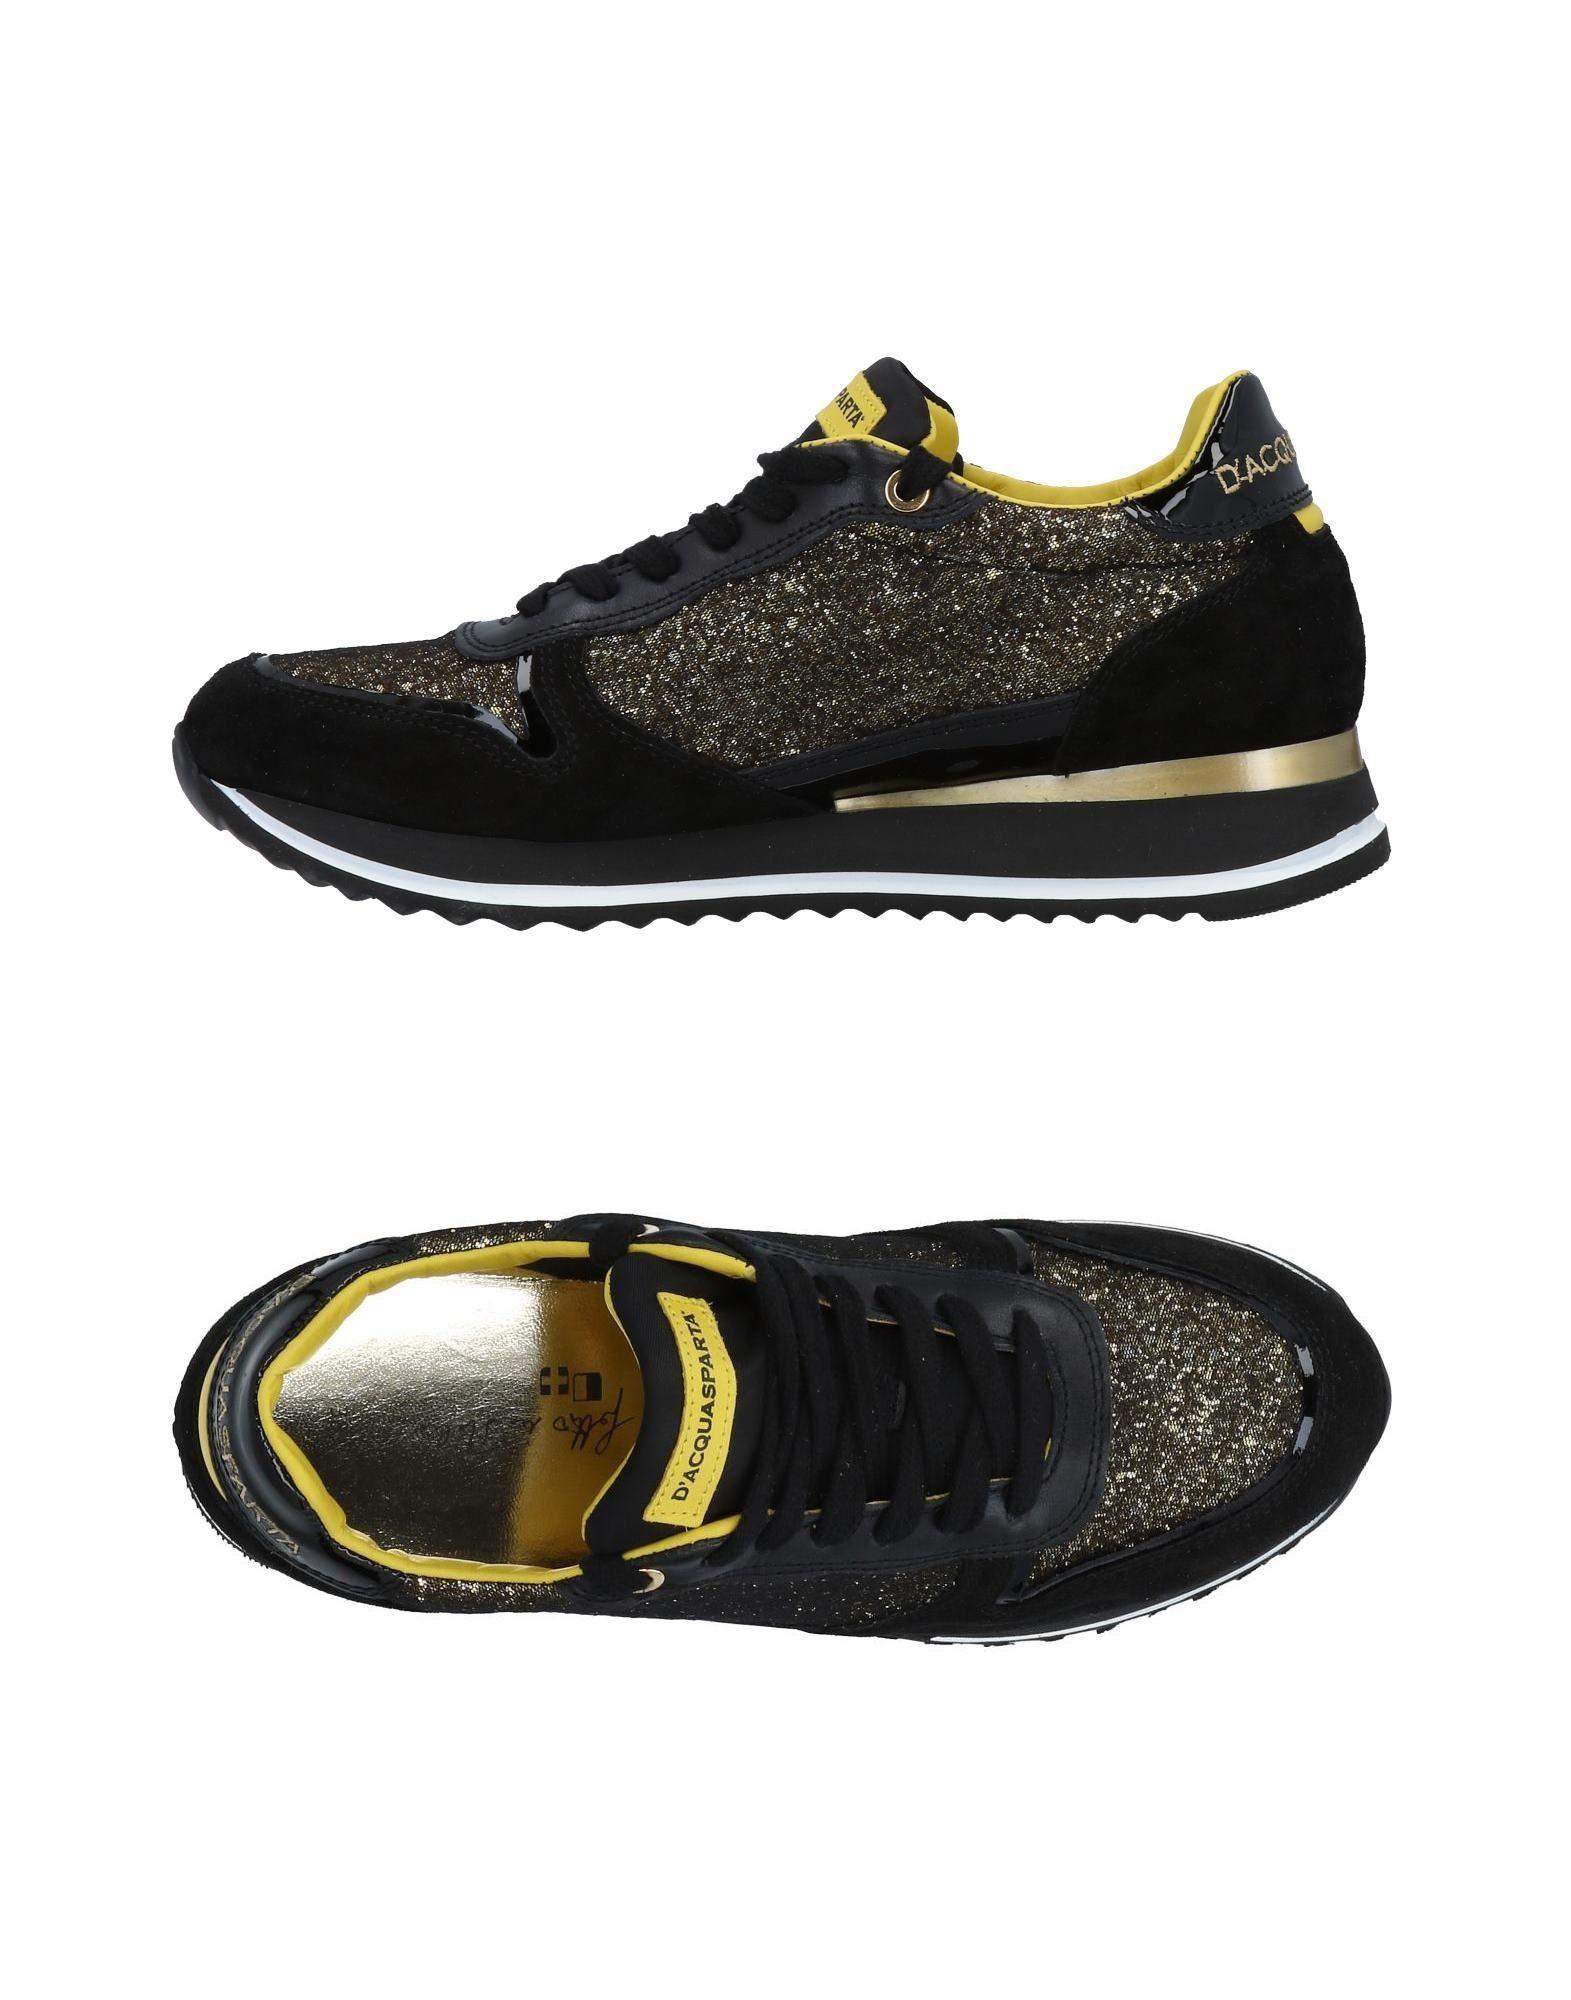 D'Acquasparta Sneakers Damen  11492717IK 11492717IK 11492717IK Gute Qualität beliebte Schuhe 63d13f